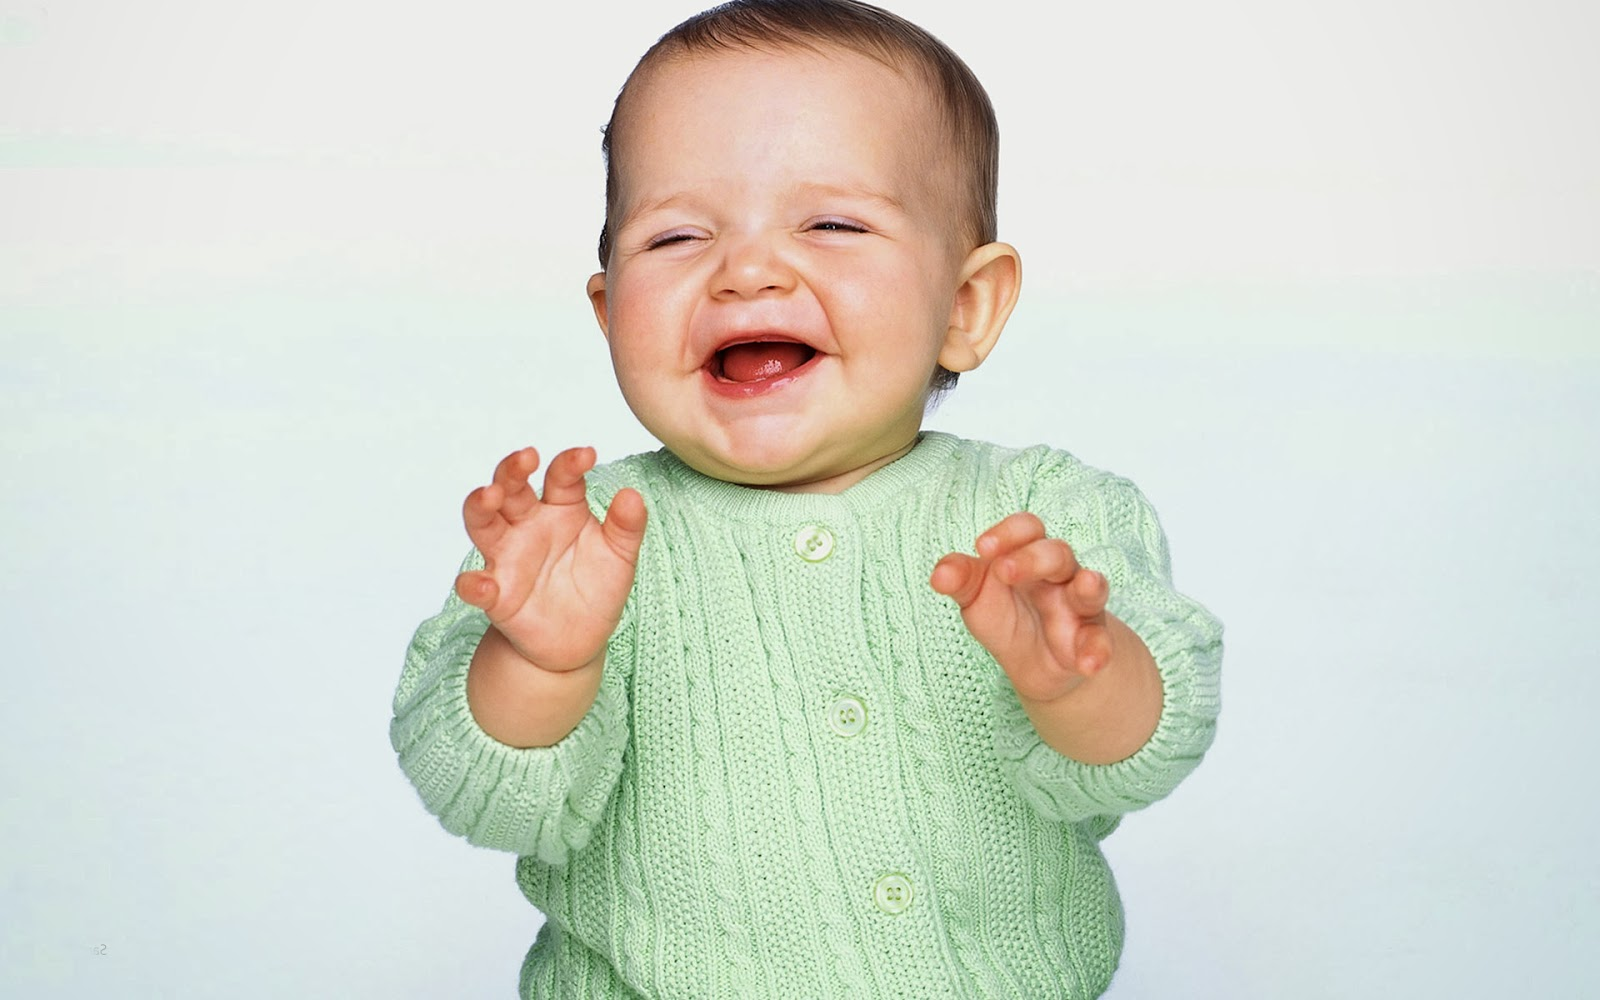 Amazing Smileof Cute Baby Boy